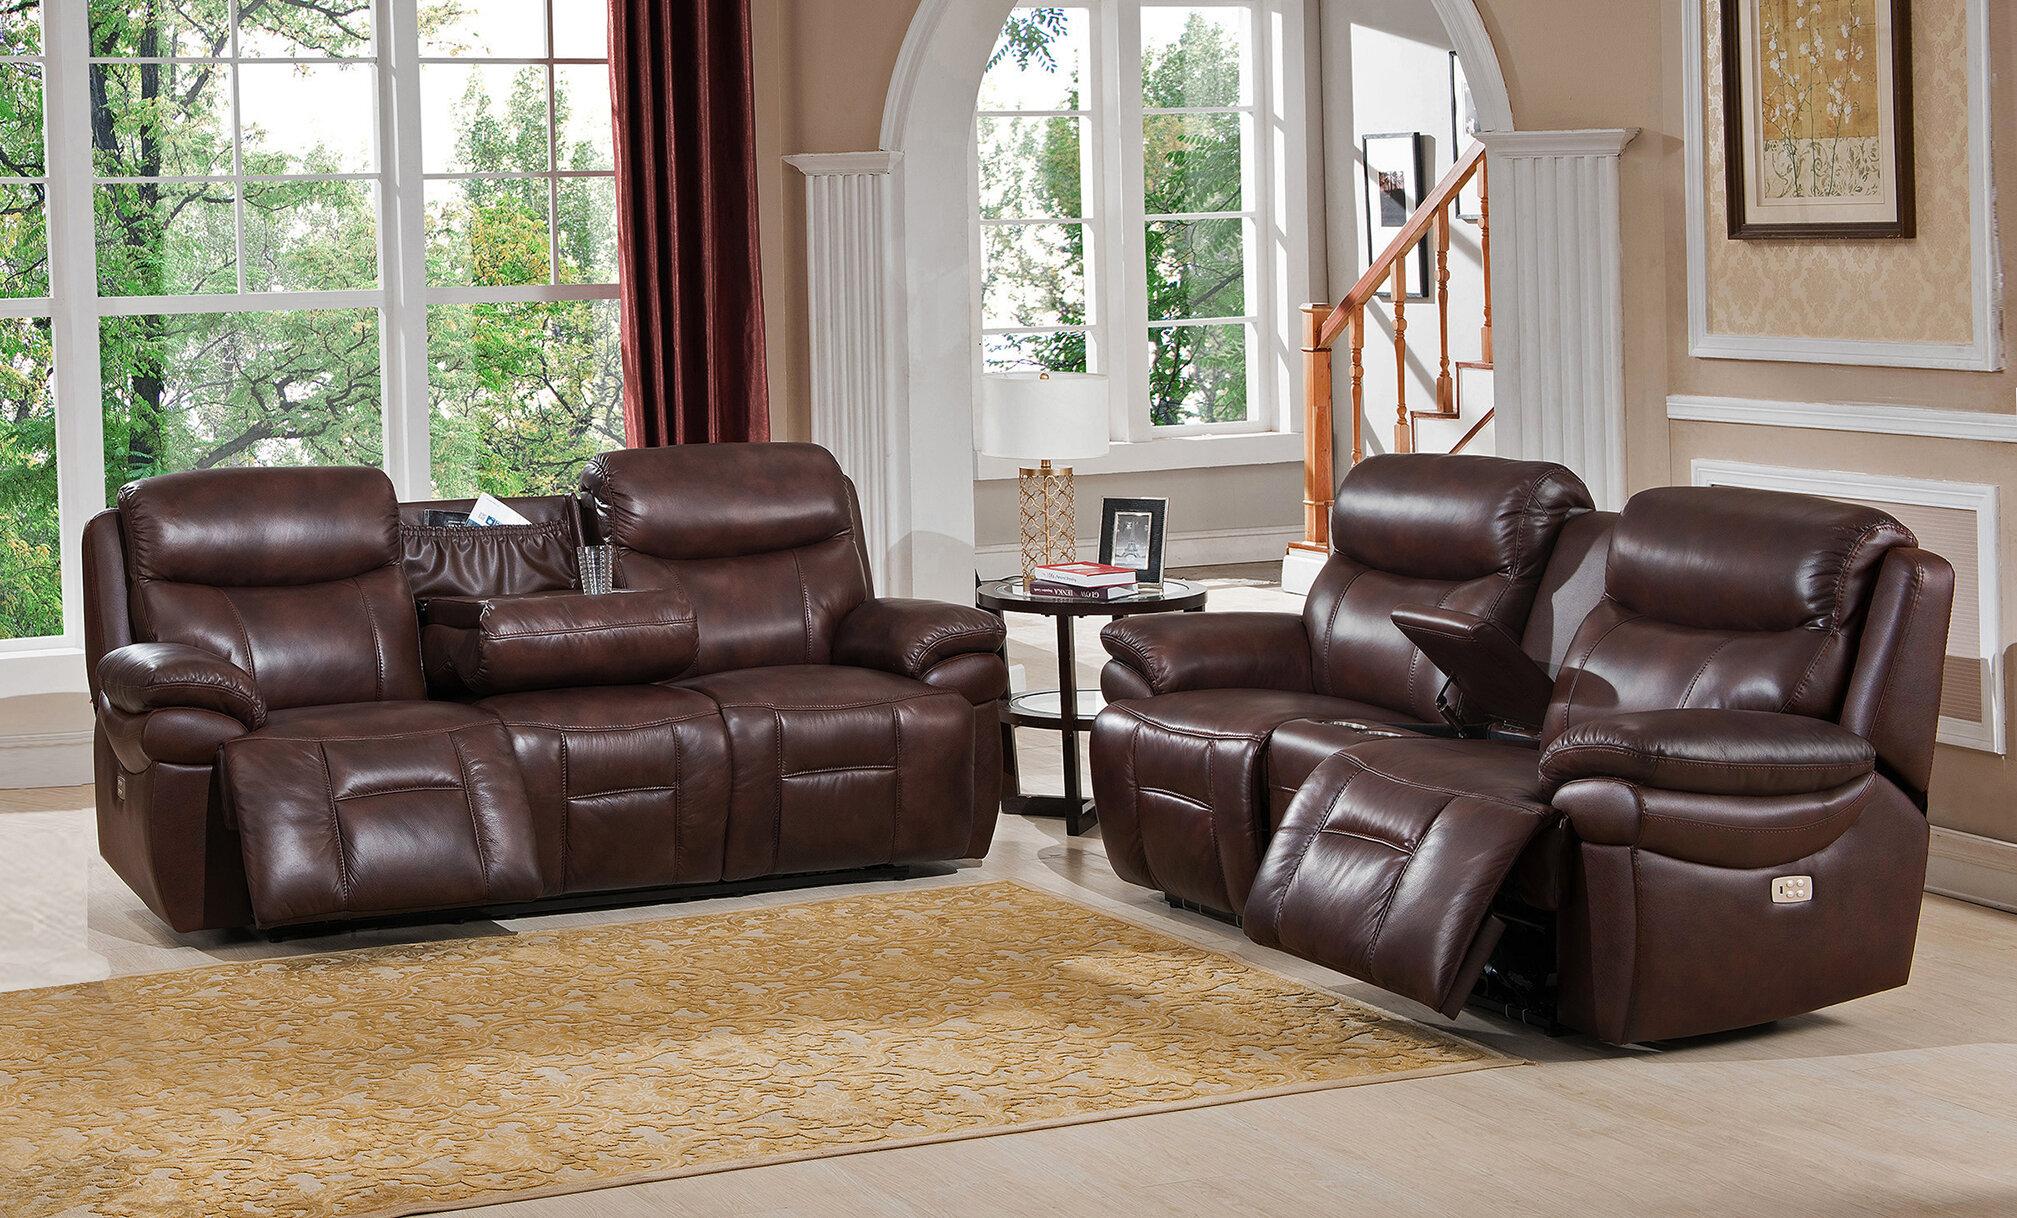 Red barrel studio kubik 2 piece leather reclining living room set wayfair